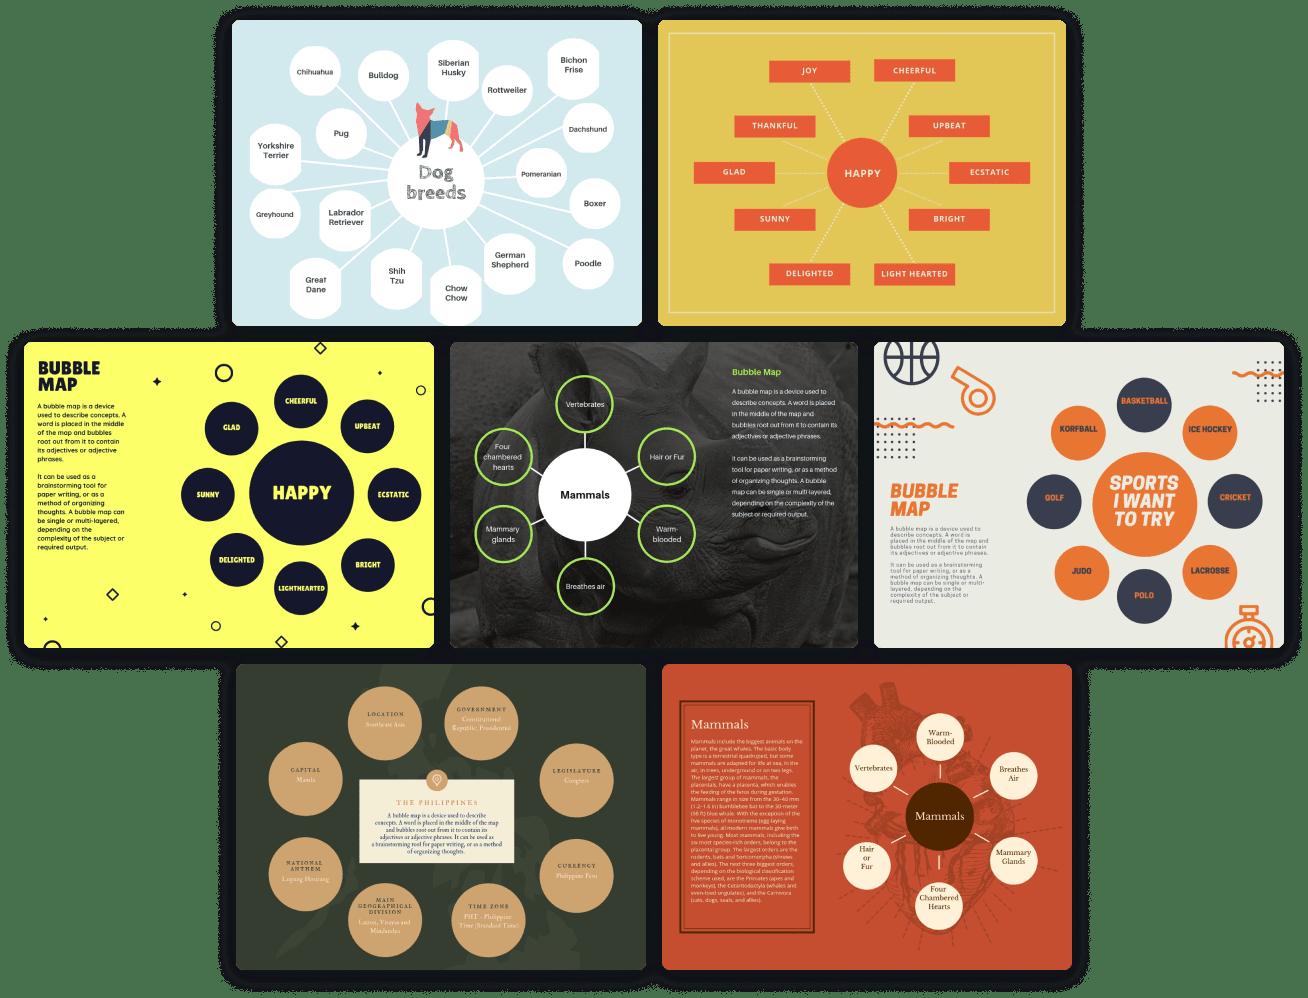 bubble-map-templates